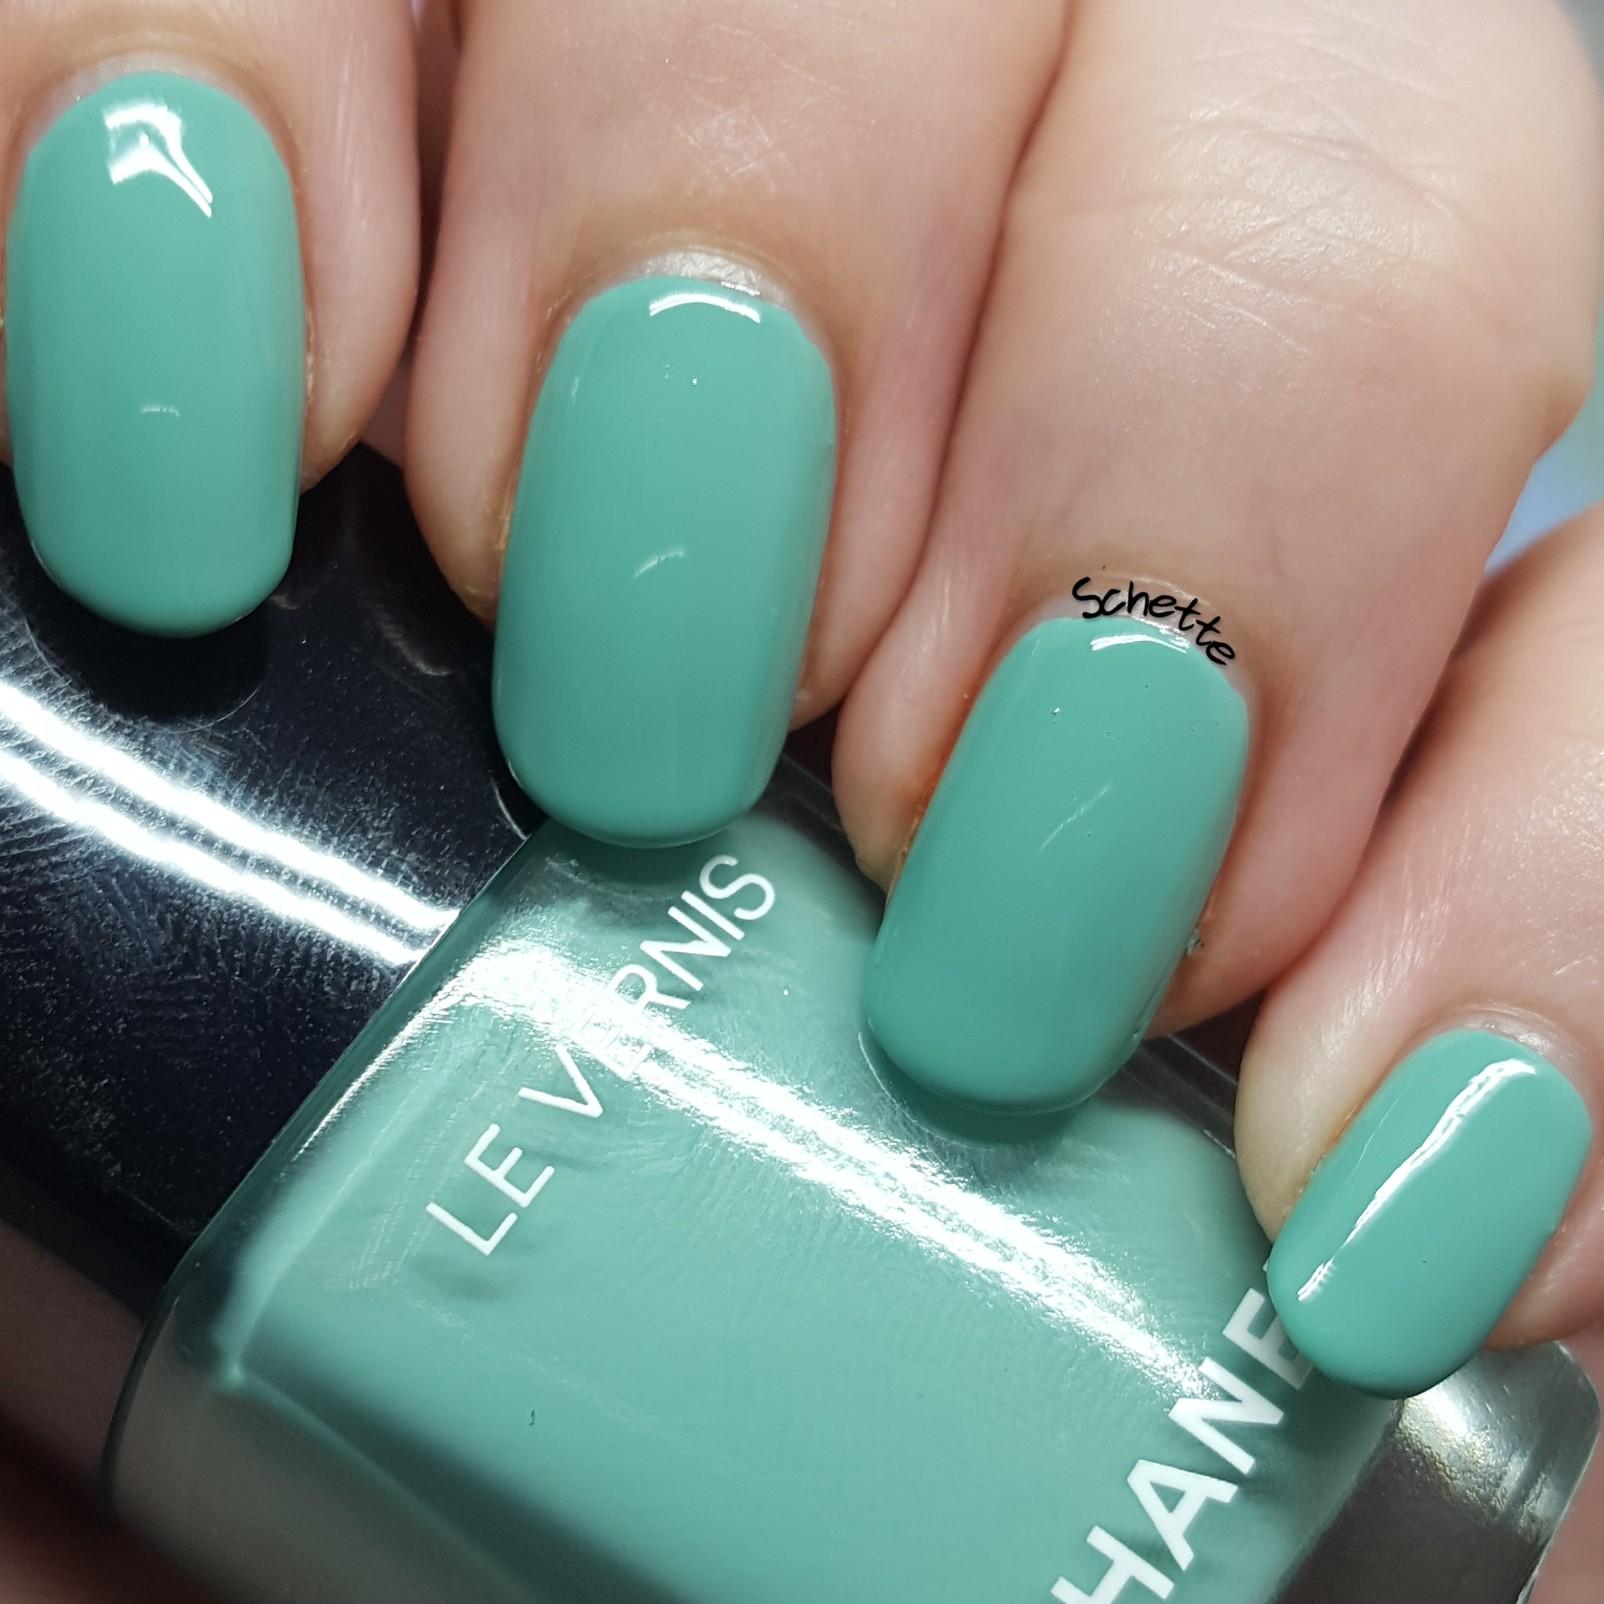 Chanel - Verde Pastello